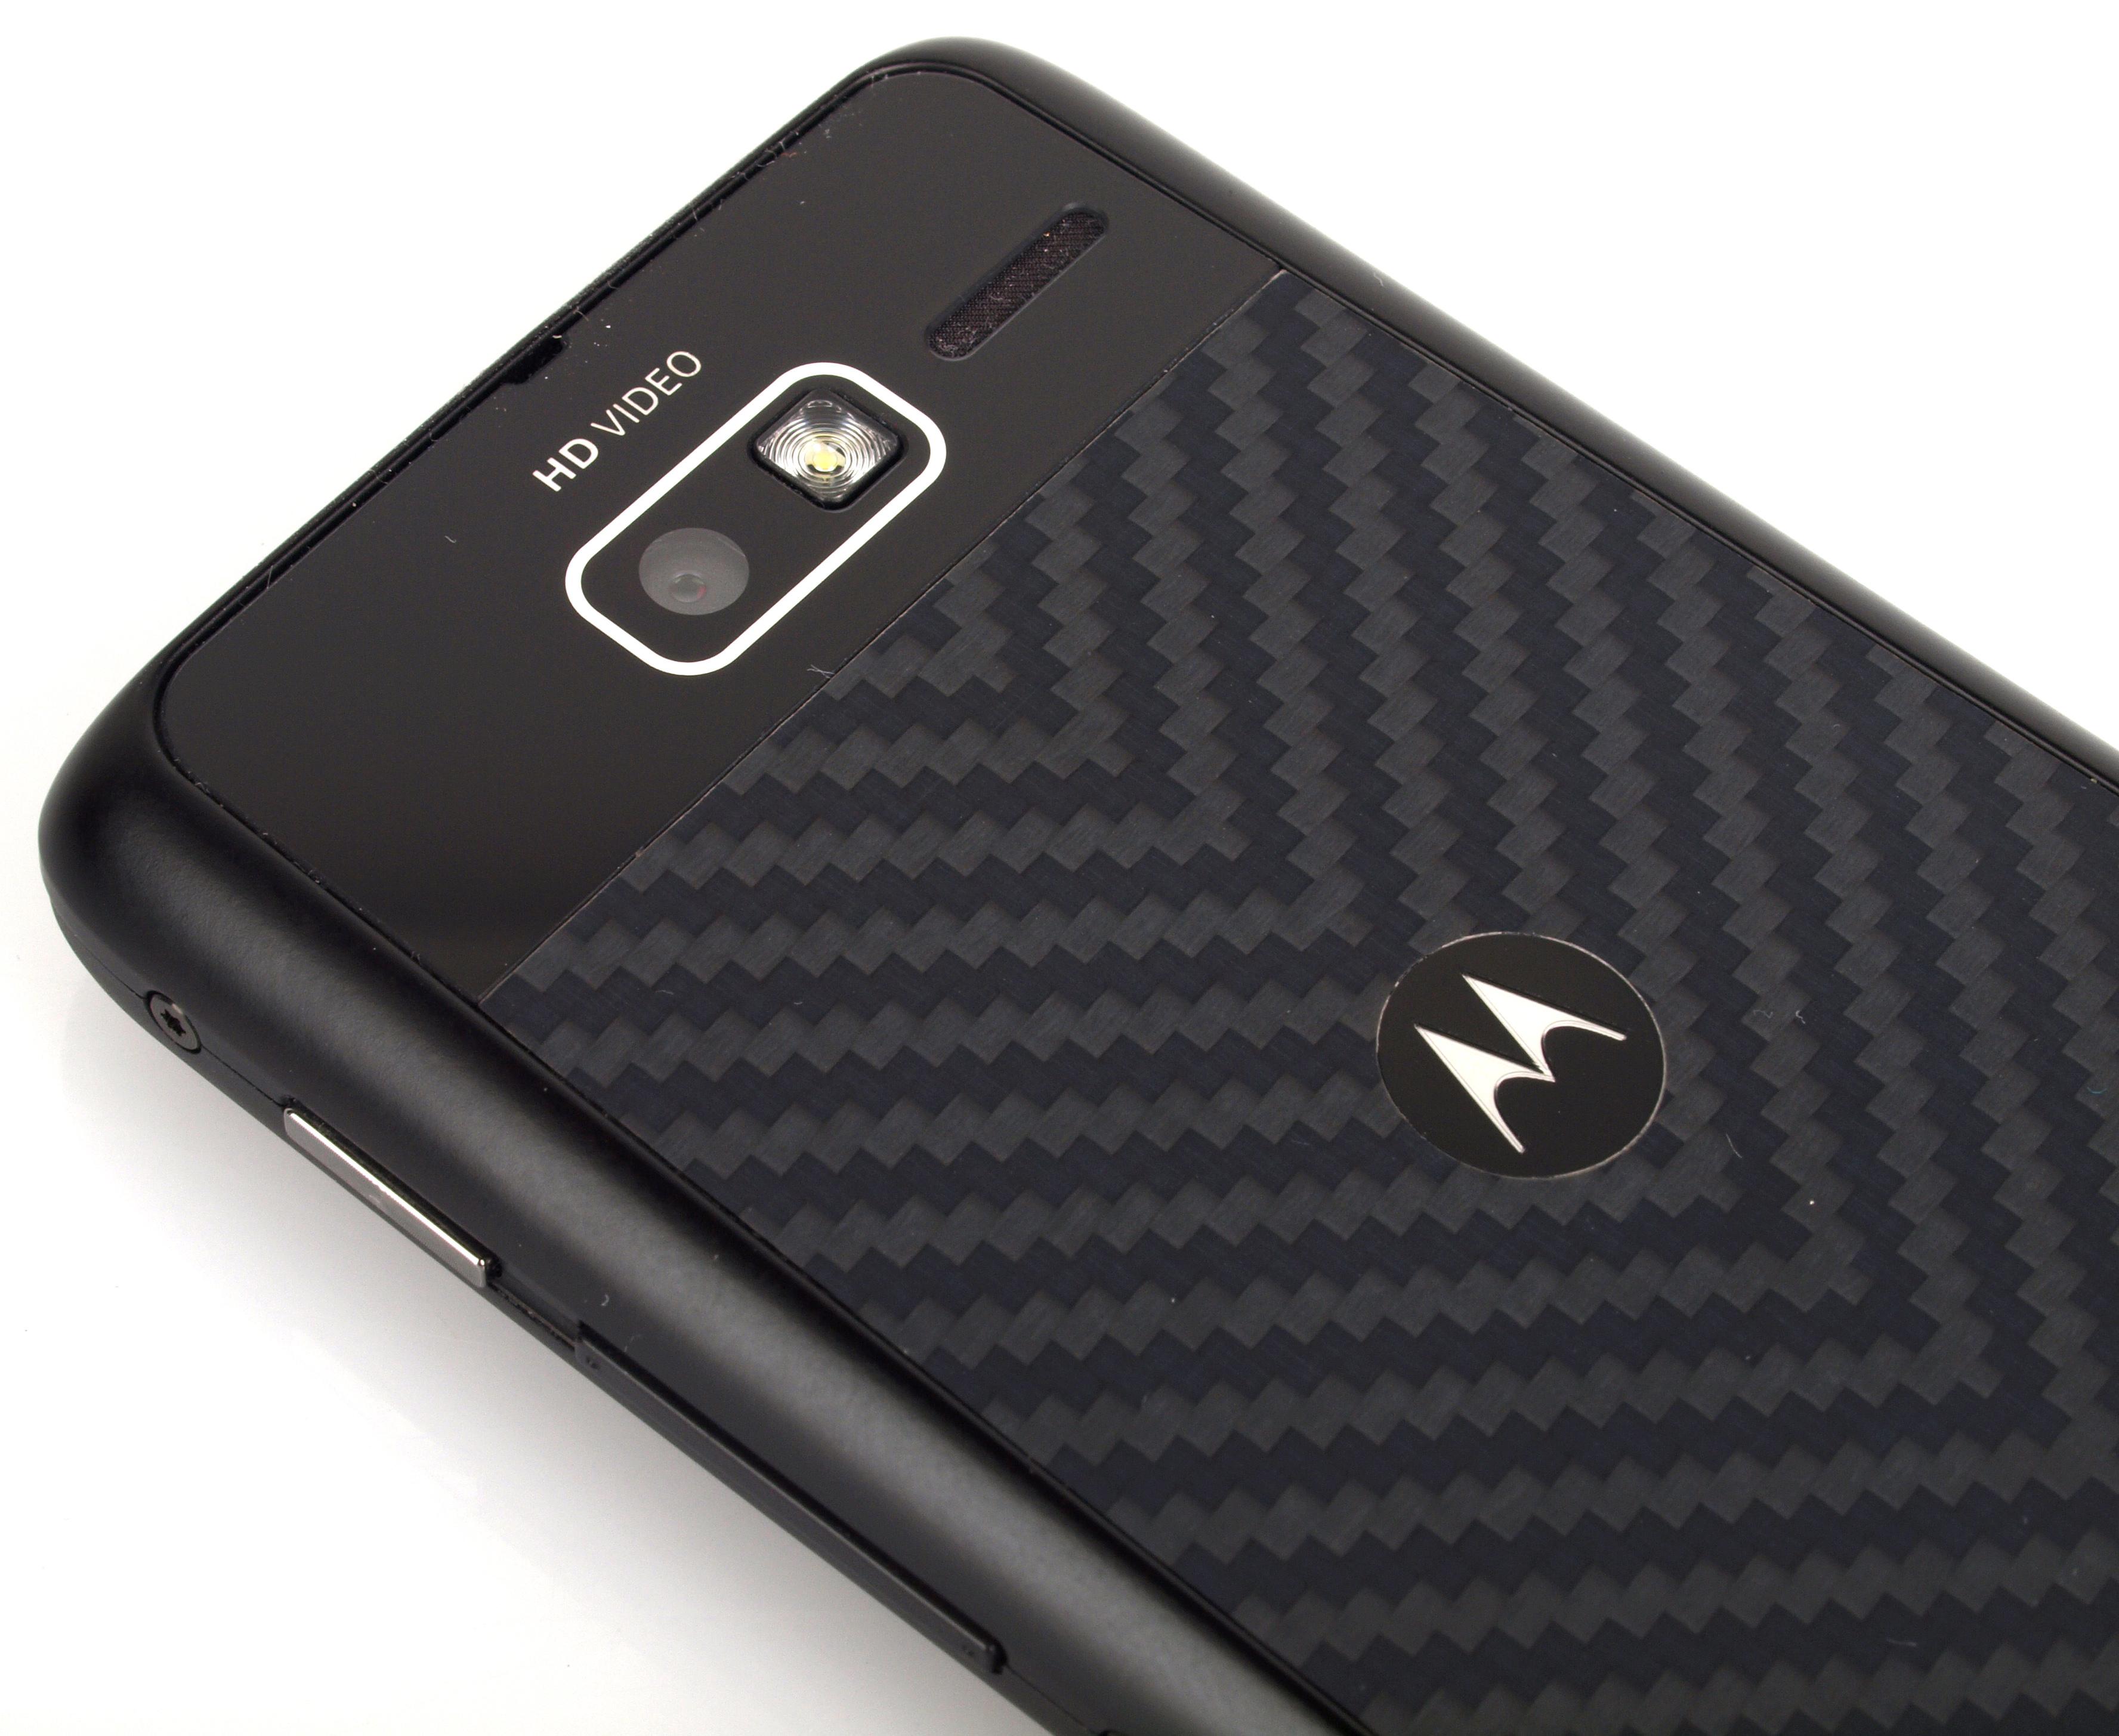 Motorola Razr I Xt890 Camera Phone Review Ephotozine